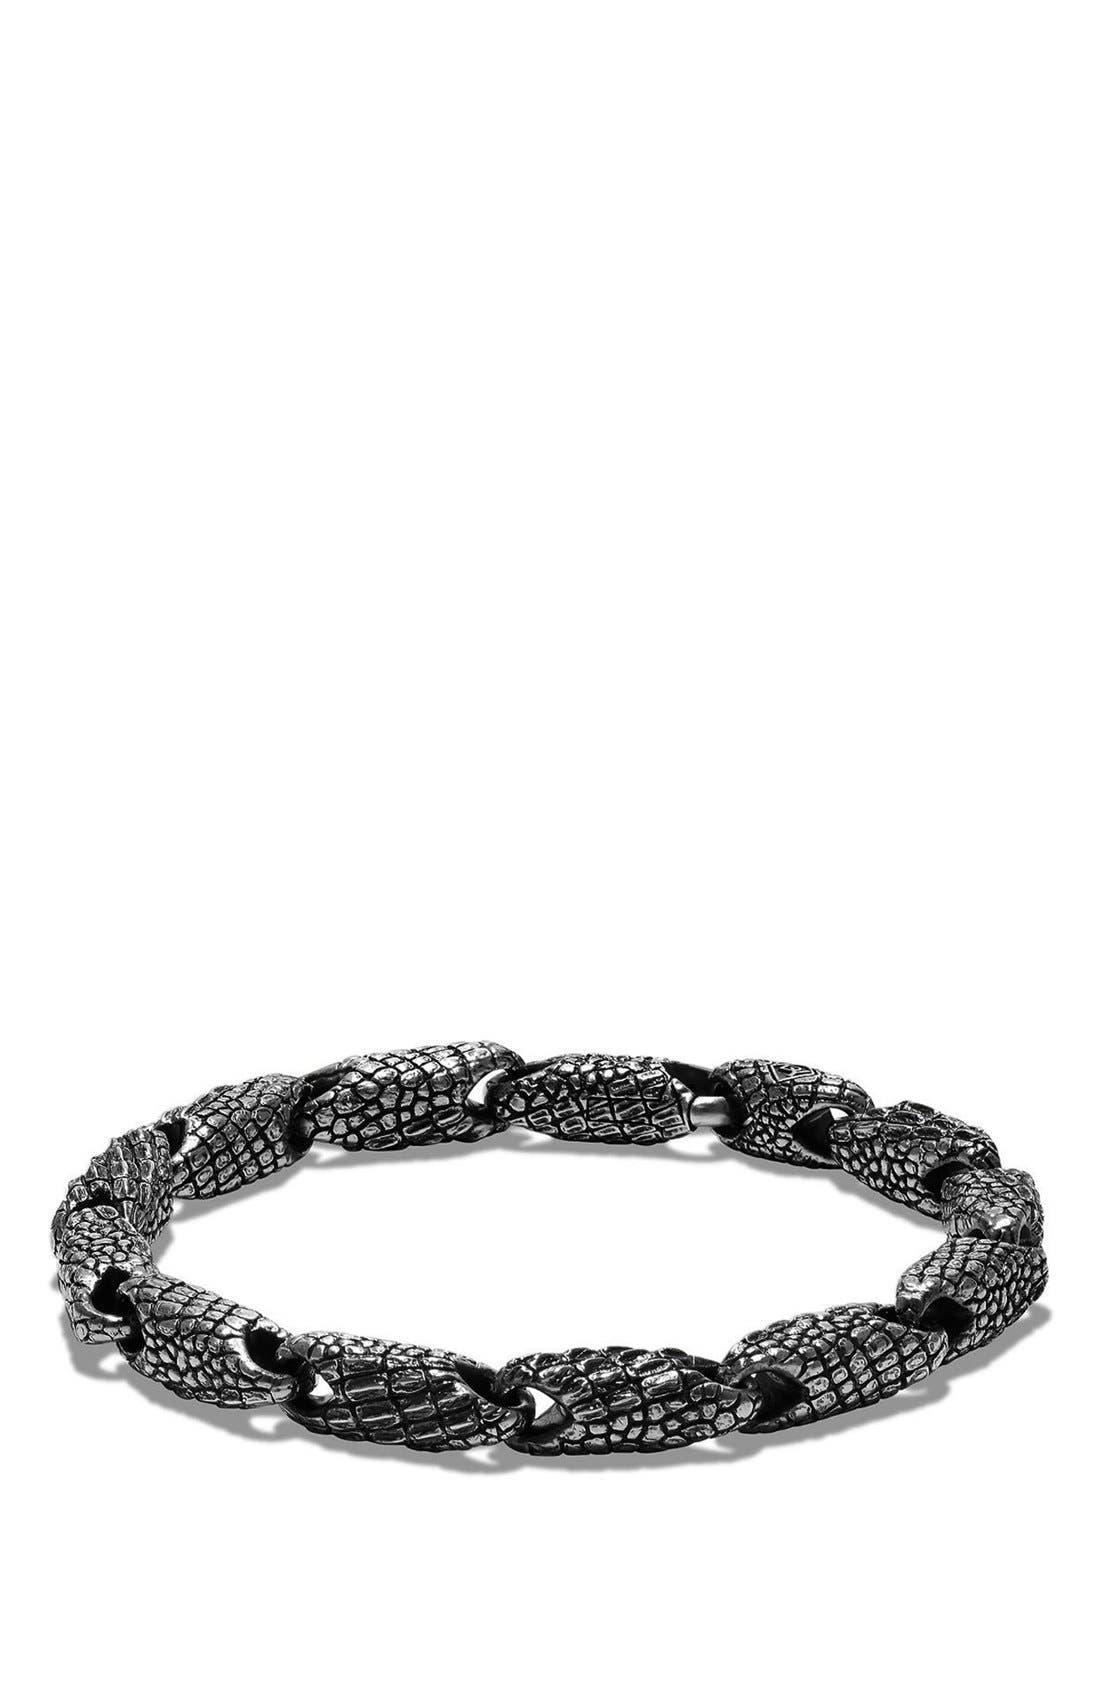 David Yurman 'Naturals' Gator Link Bracelet